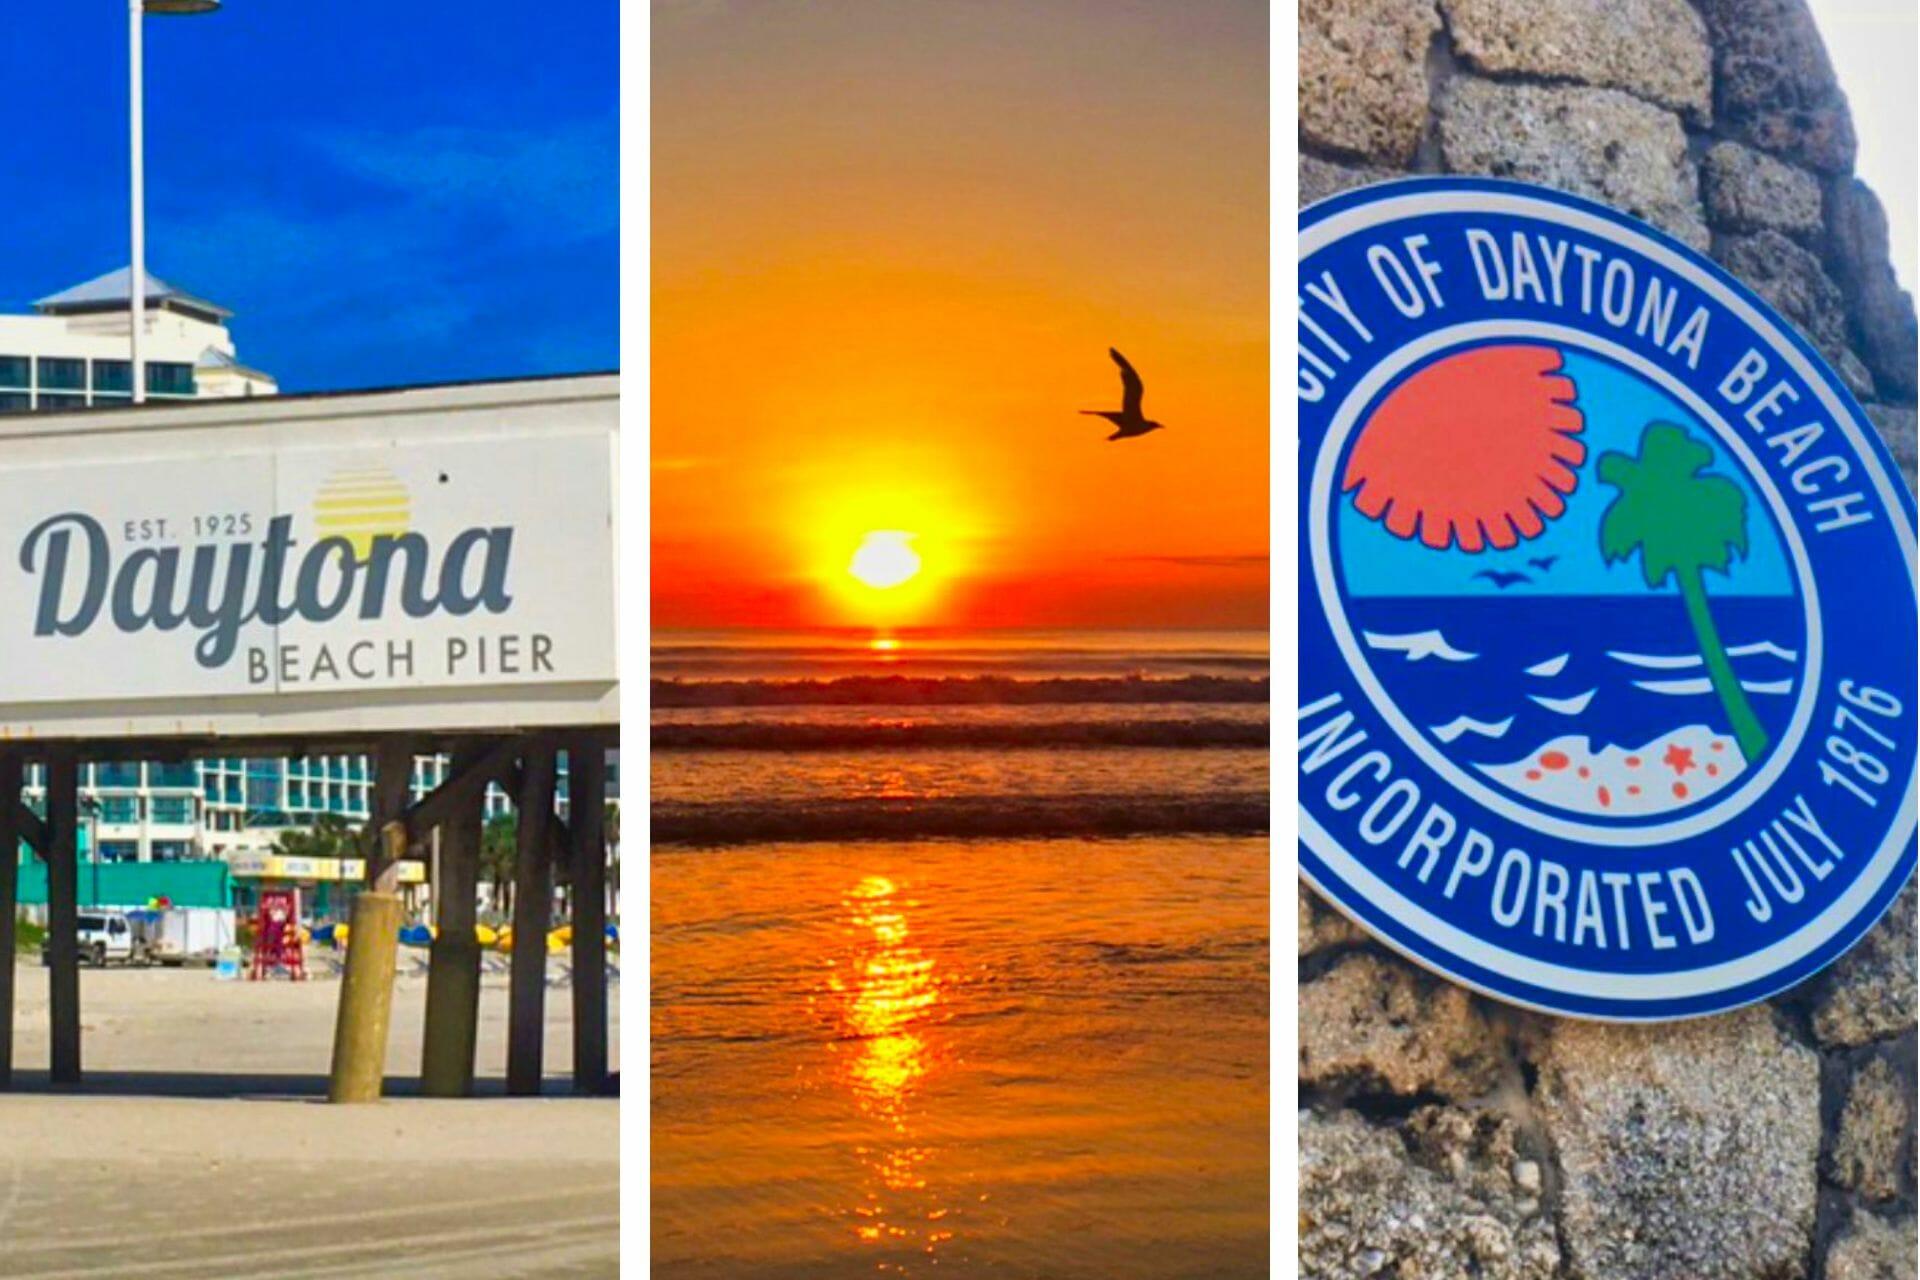 17+ Best Things to Do near Daytona Beach, Florida (2021) via @allamericanatlas